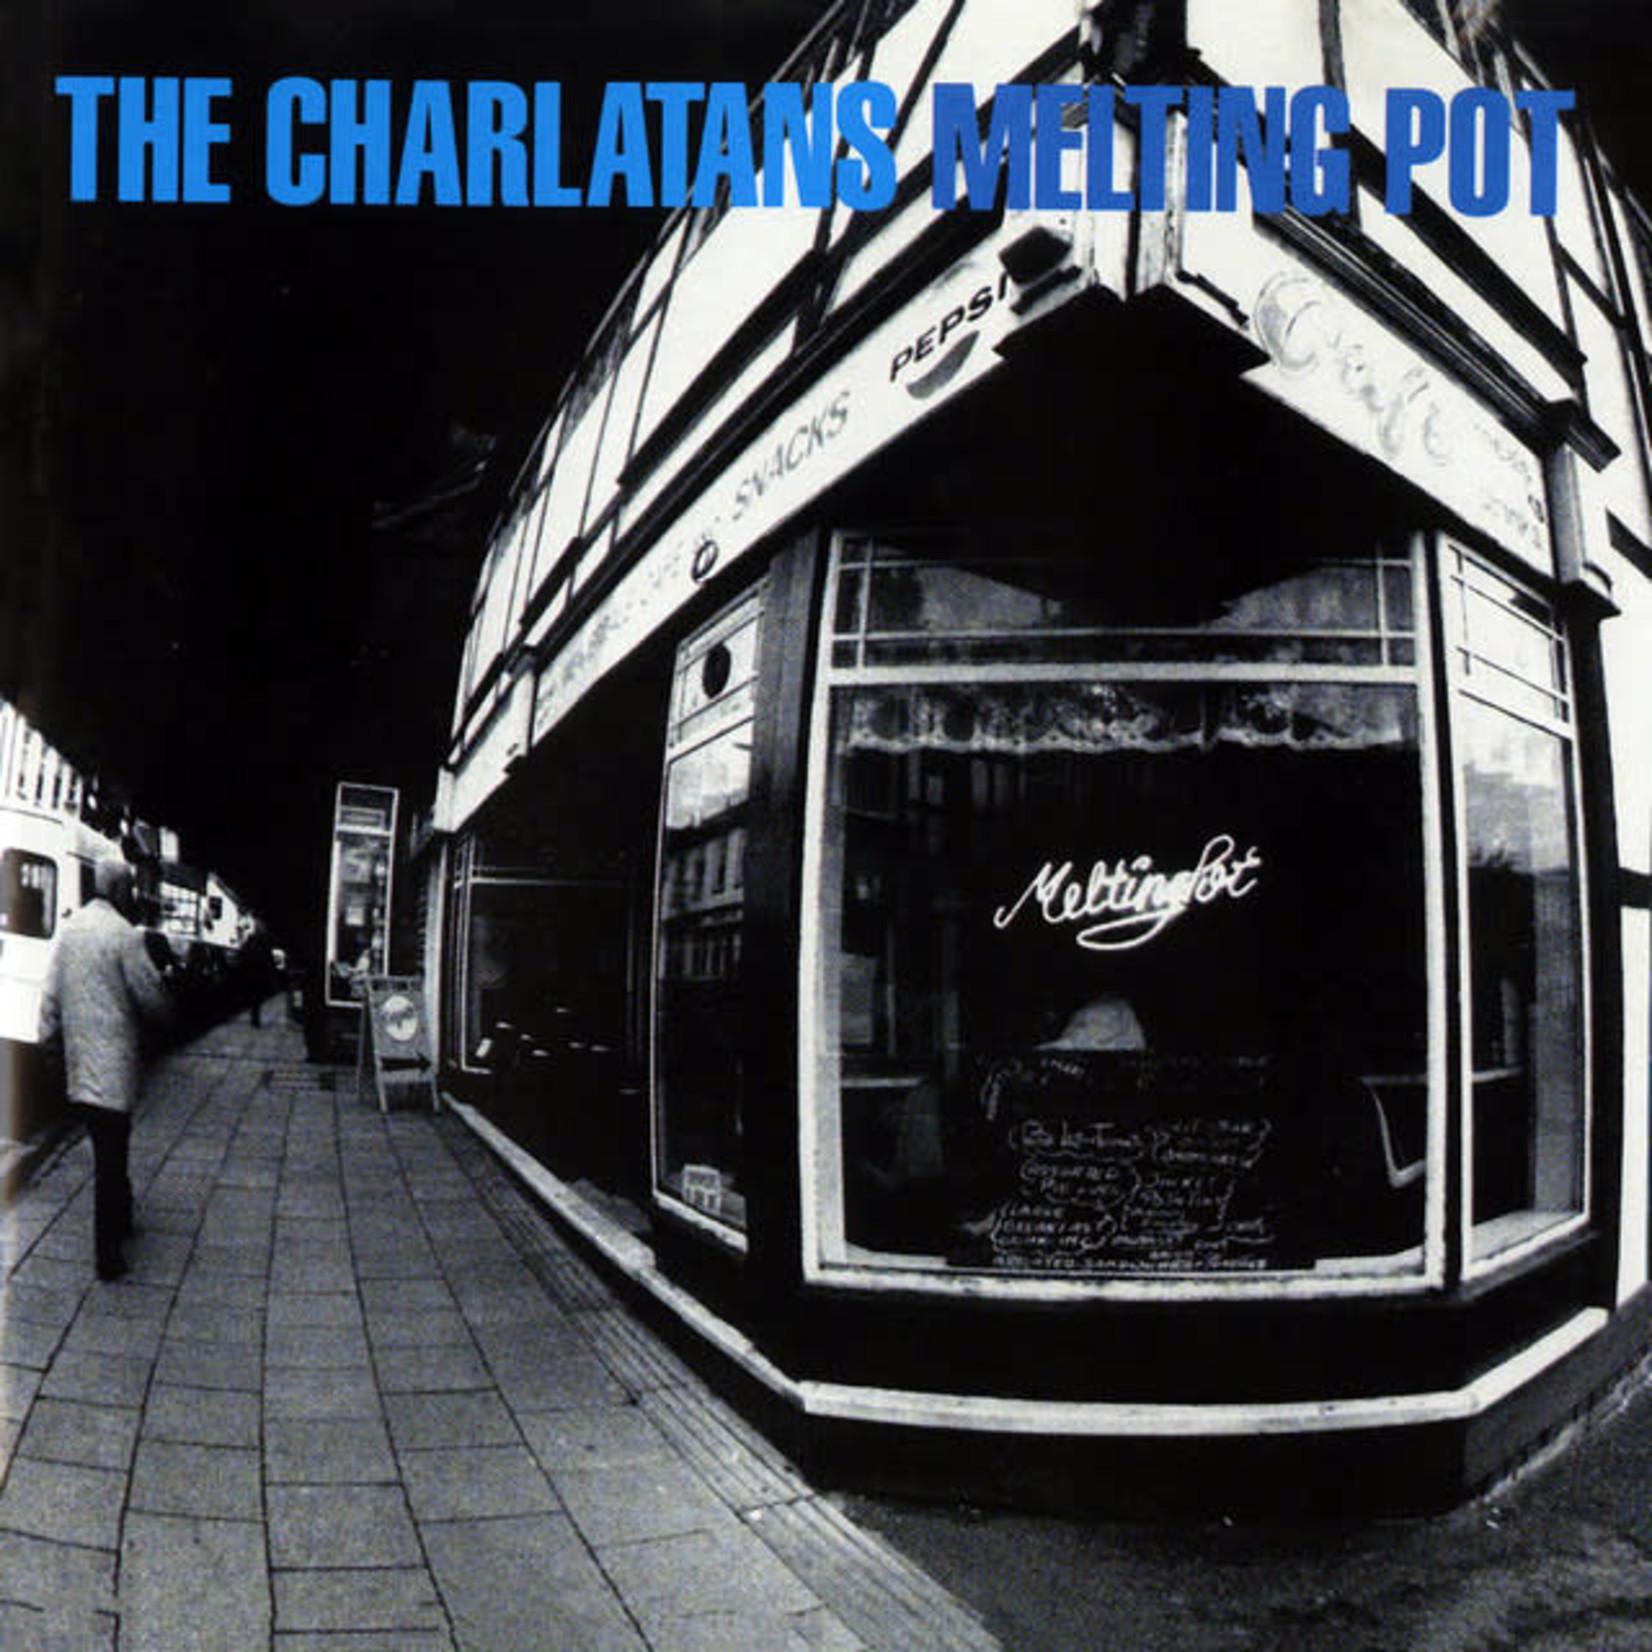 Vinyl The Charlatans - Melting Pot